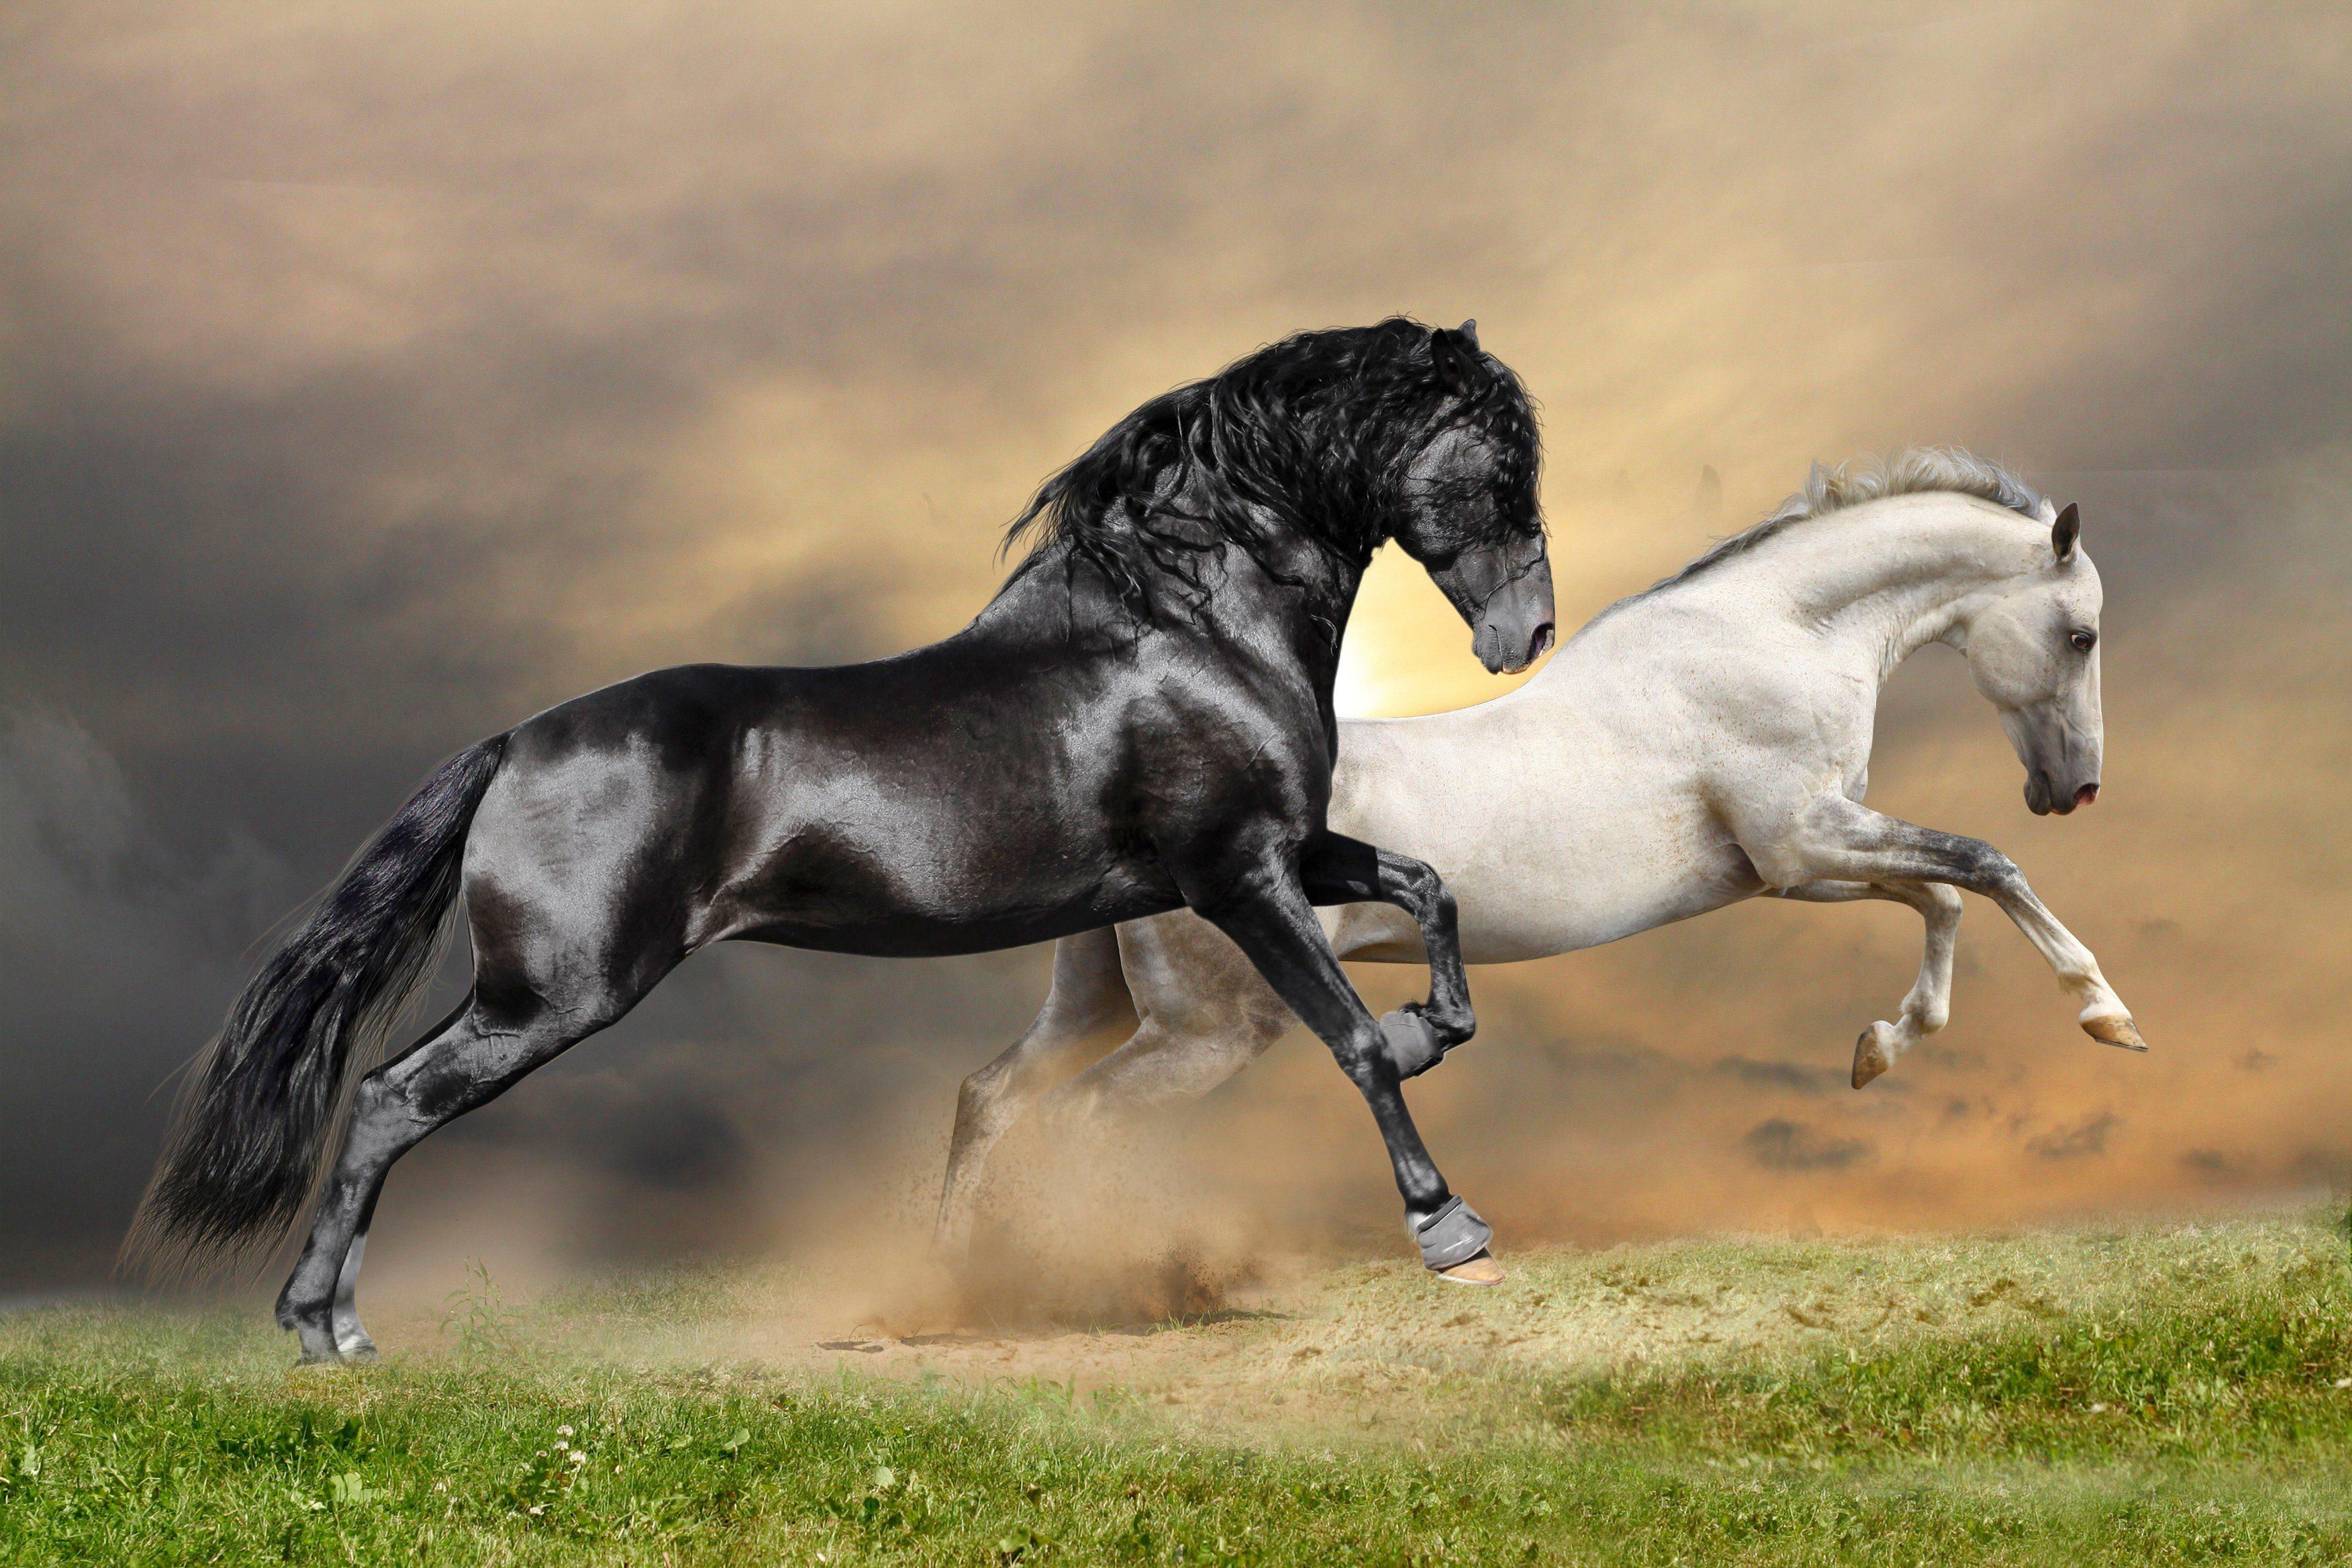 PAPERMOON Fototapete »Black and White Horses«, Vlies, 7 Bahnen, 350 x 260 cm